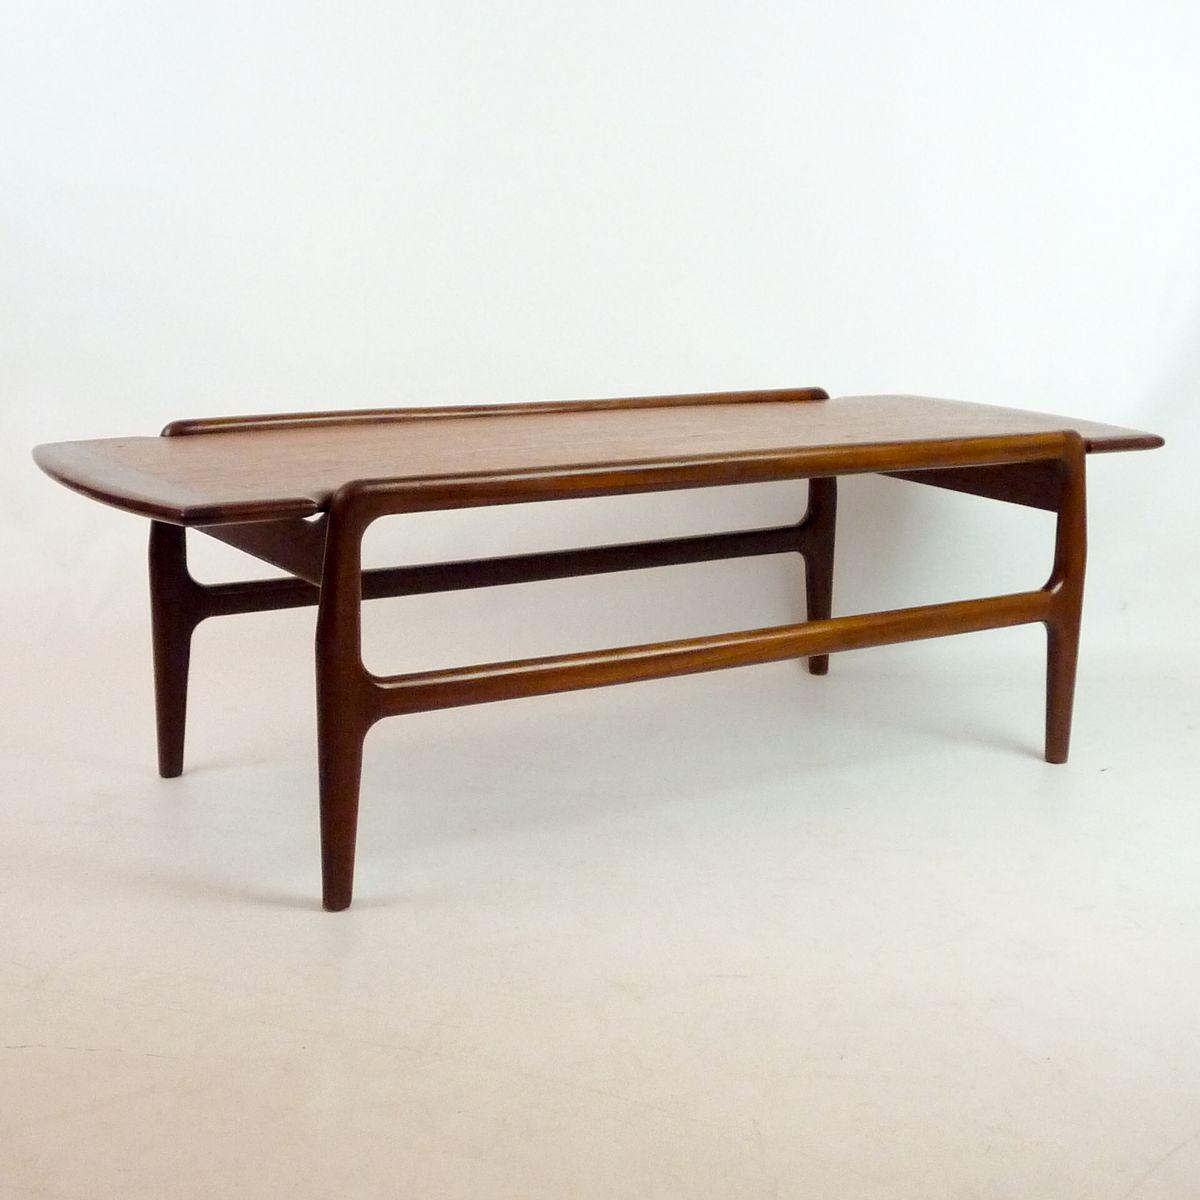 Scandinavian Teak Coffee Table 1950s For Sale At Pamono